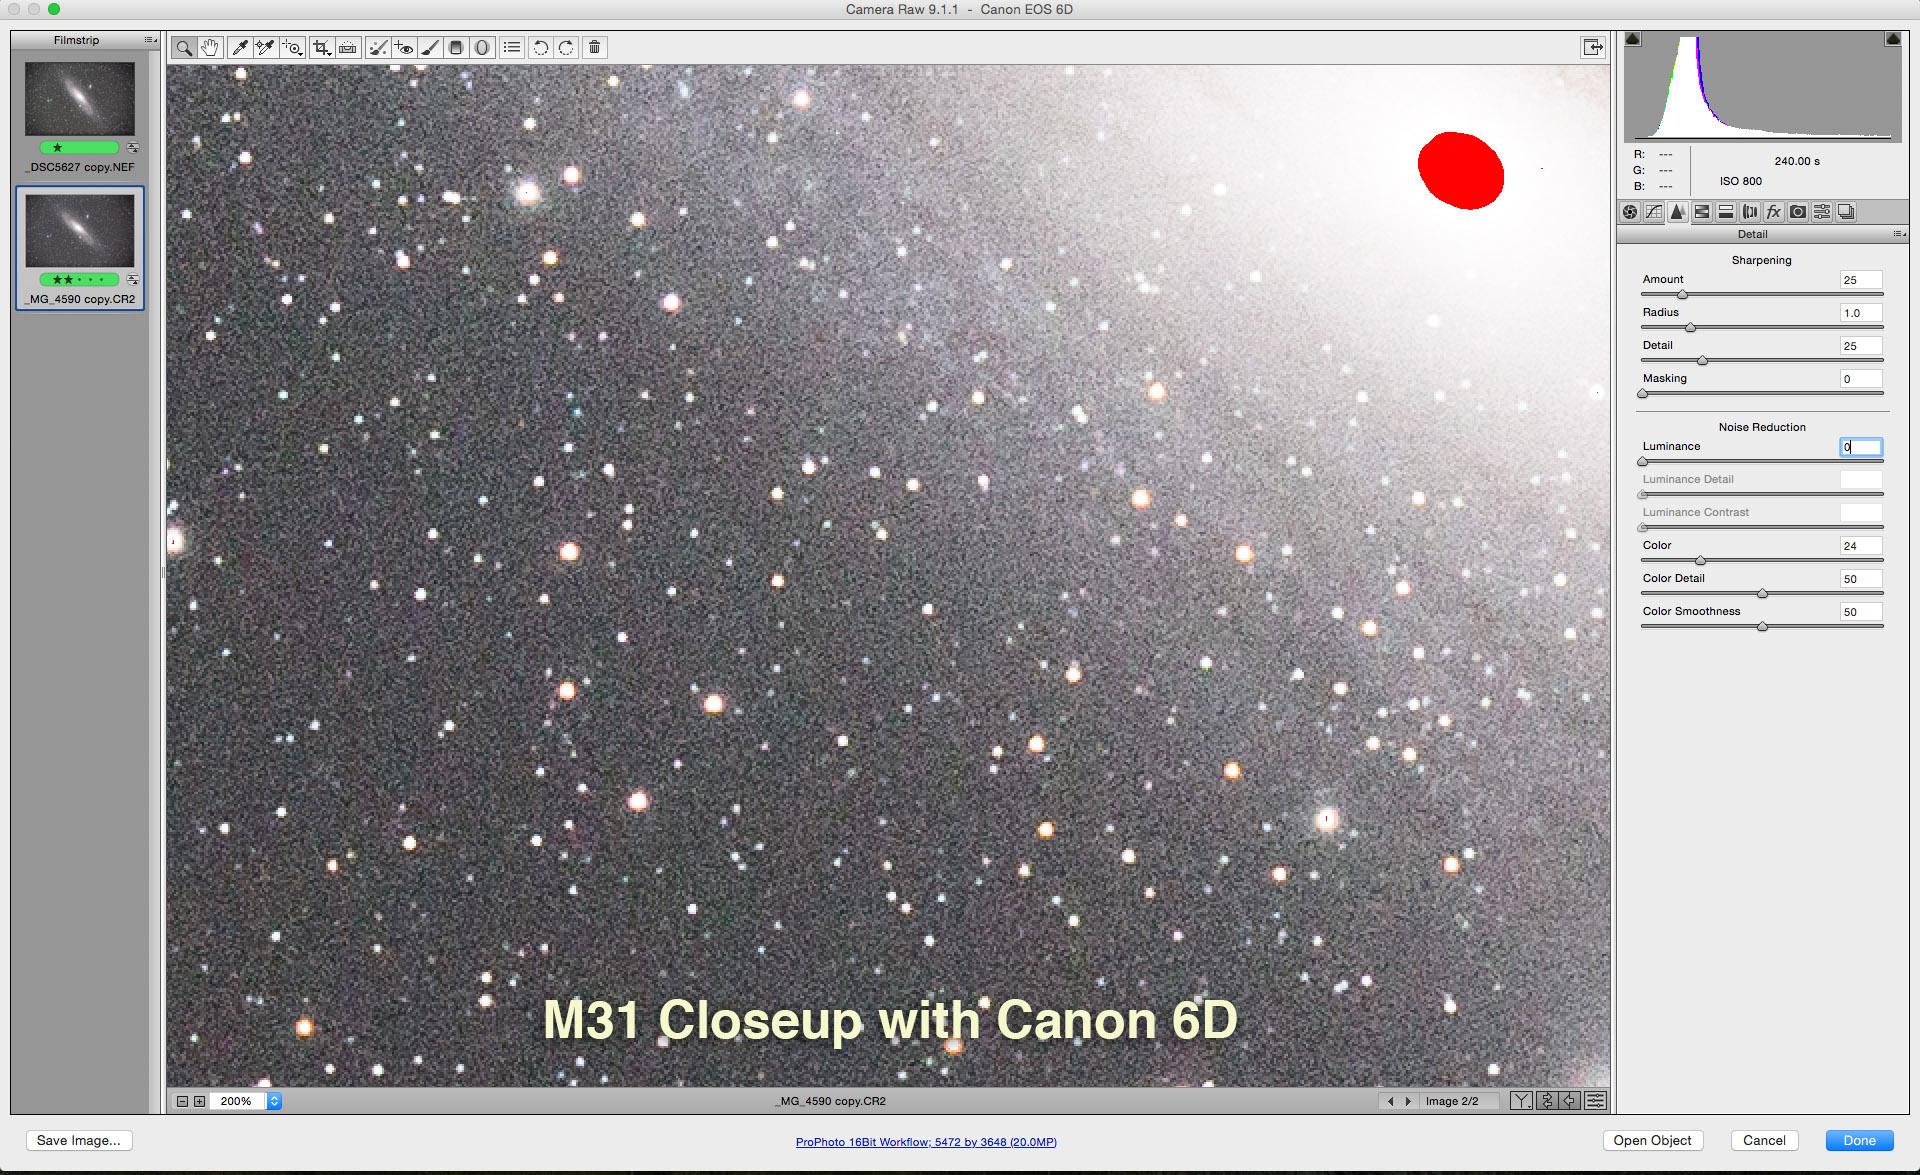 Canon 6D – The Amazing Sky